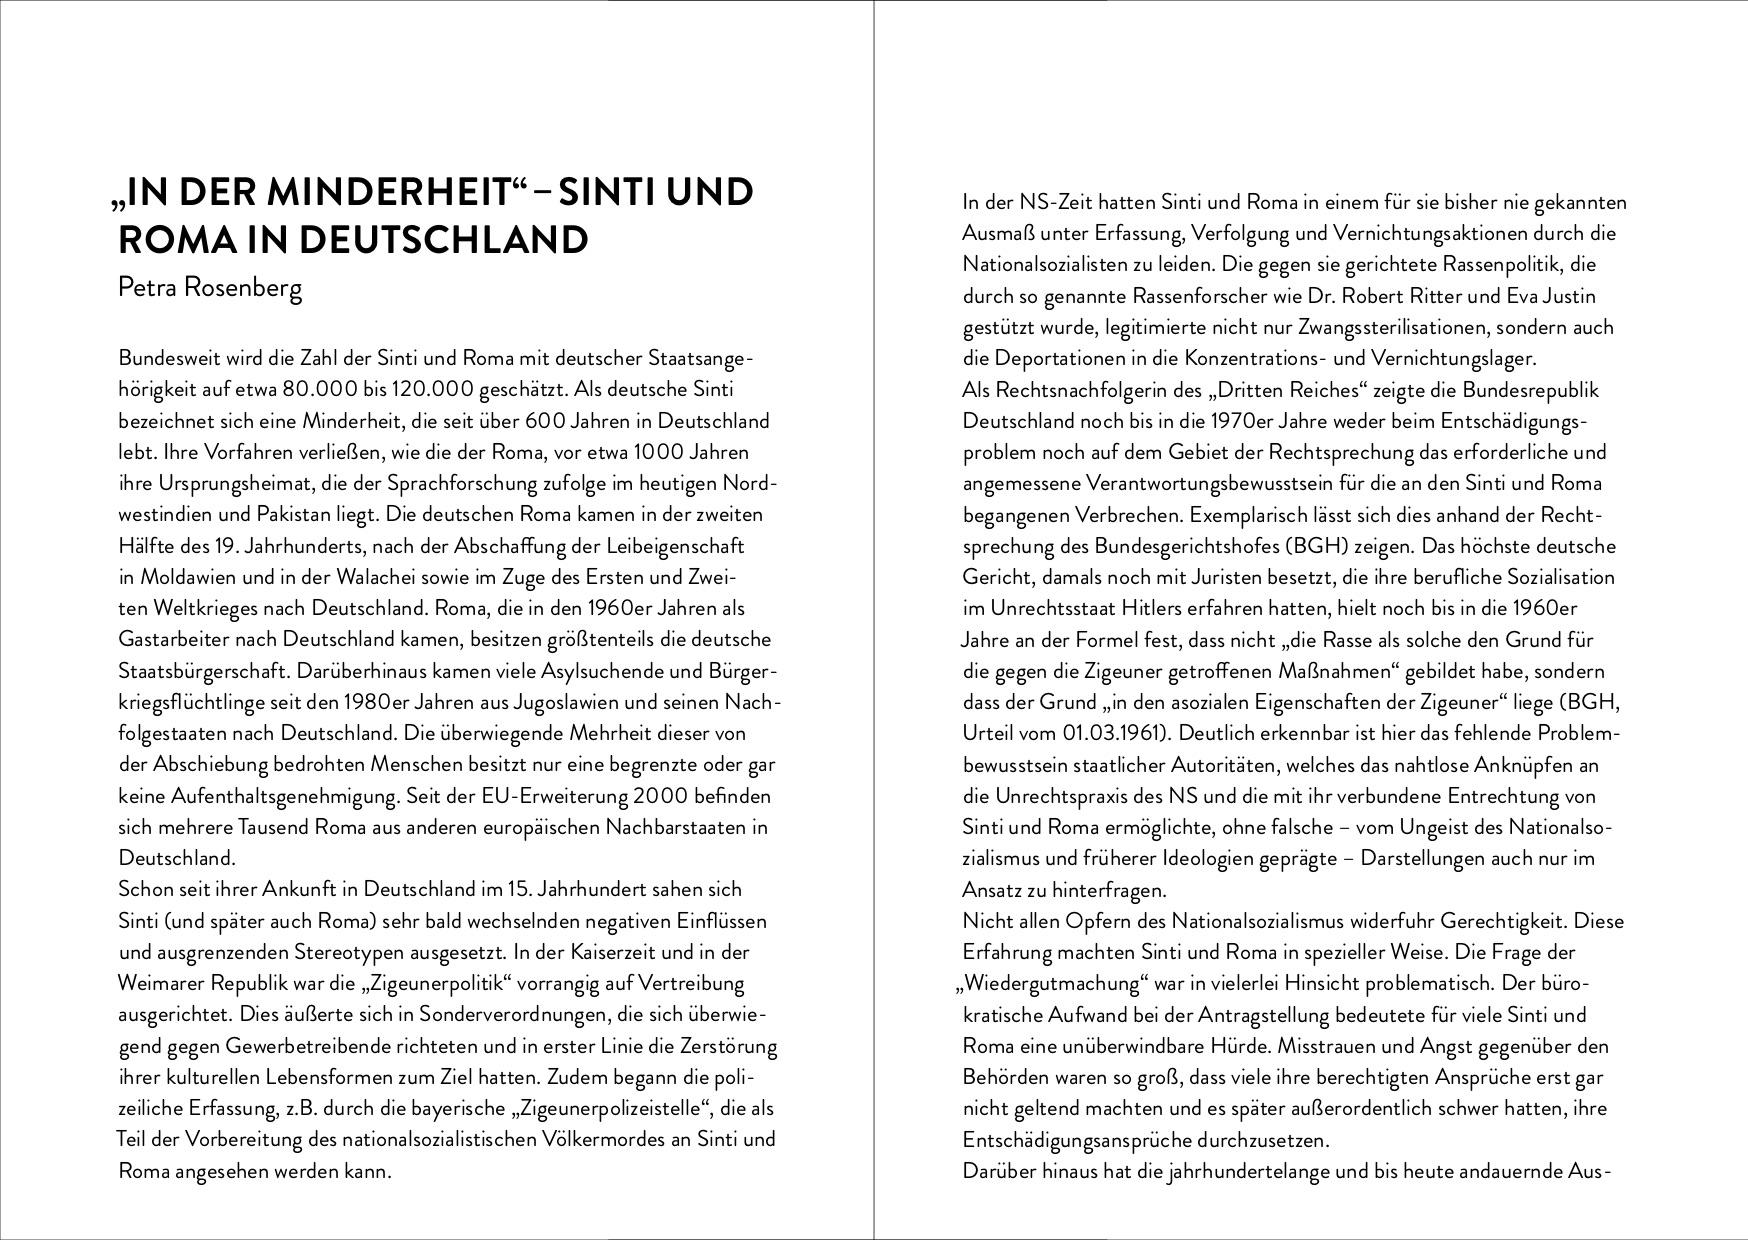 Doku-Broschüre_spreeagenten_RAM_Bro_28-Seiter_A5_03_15.12.17_S6+7.jpg